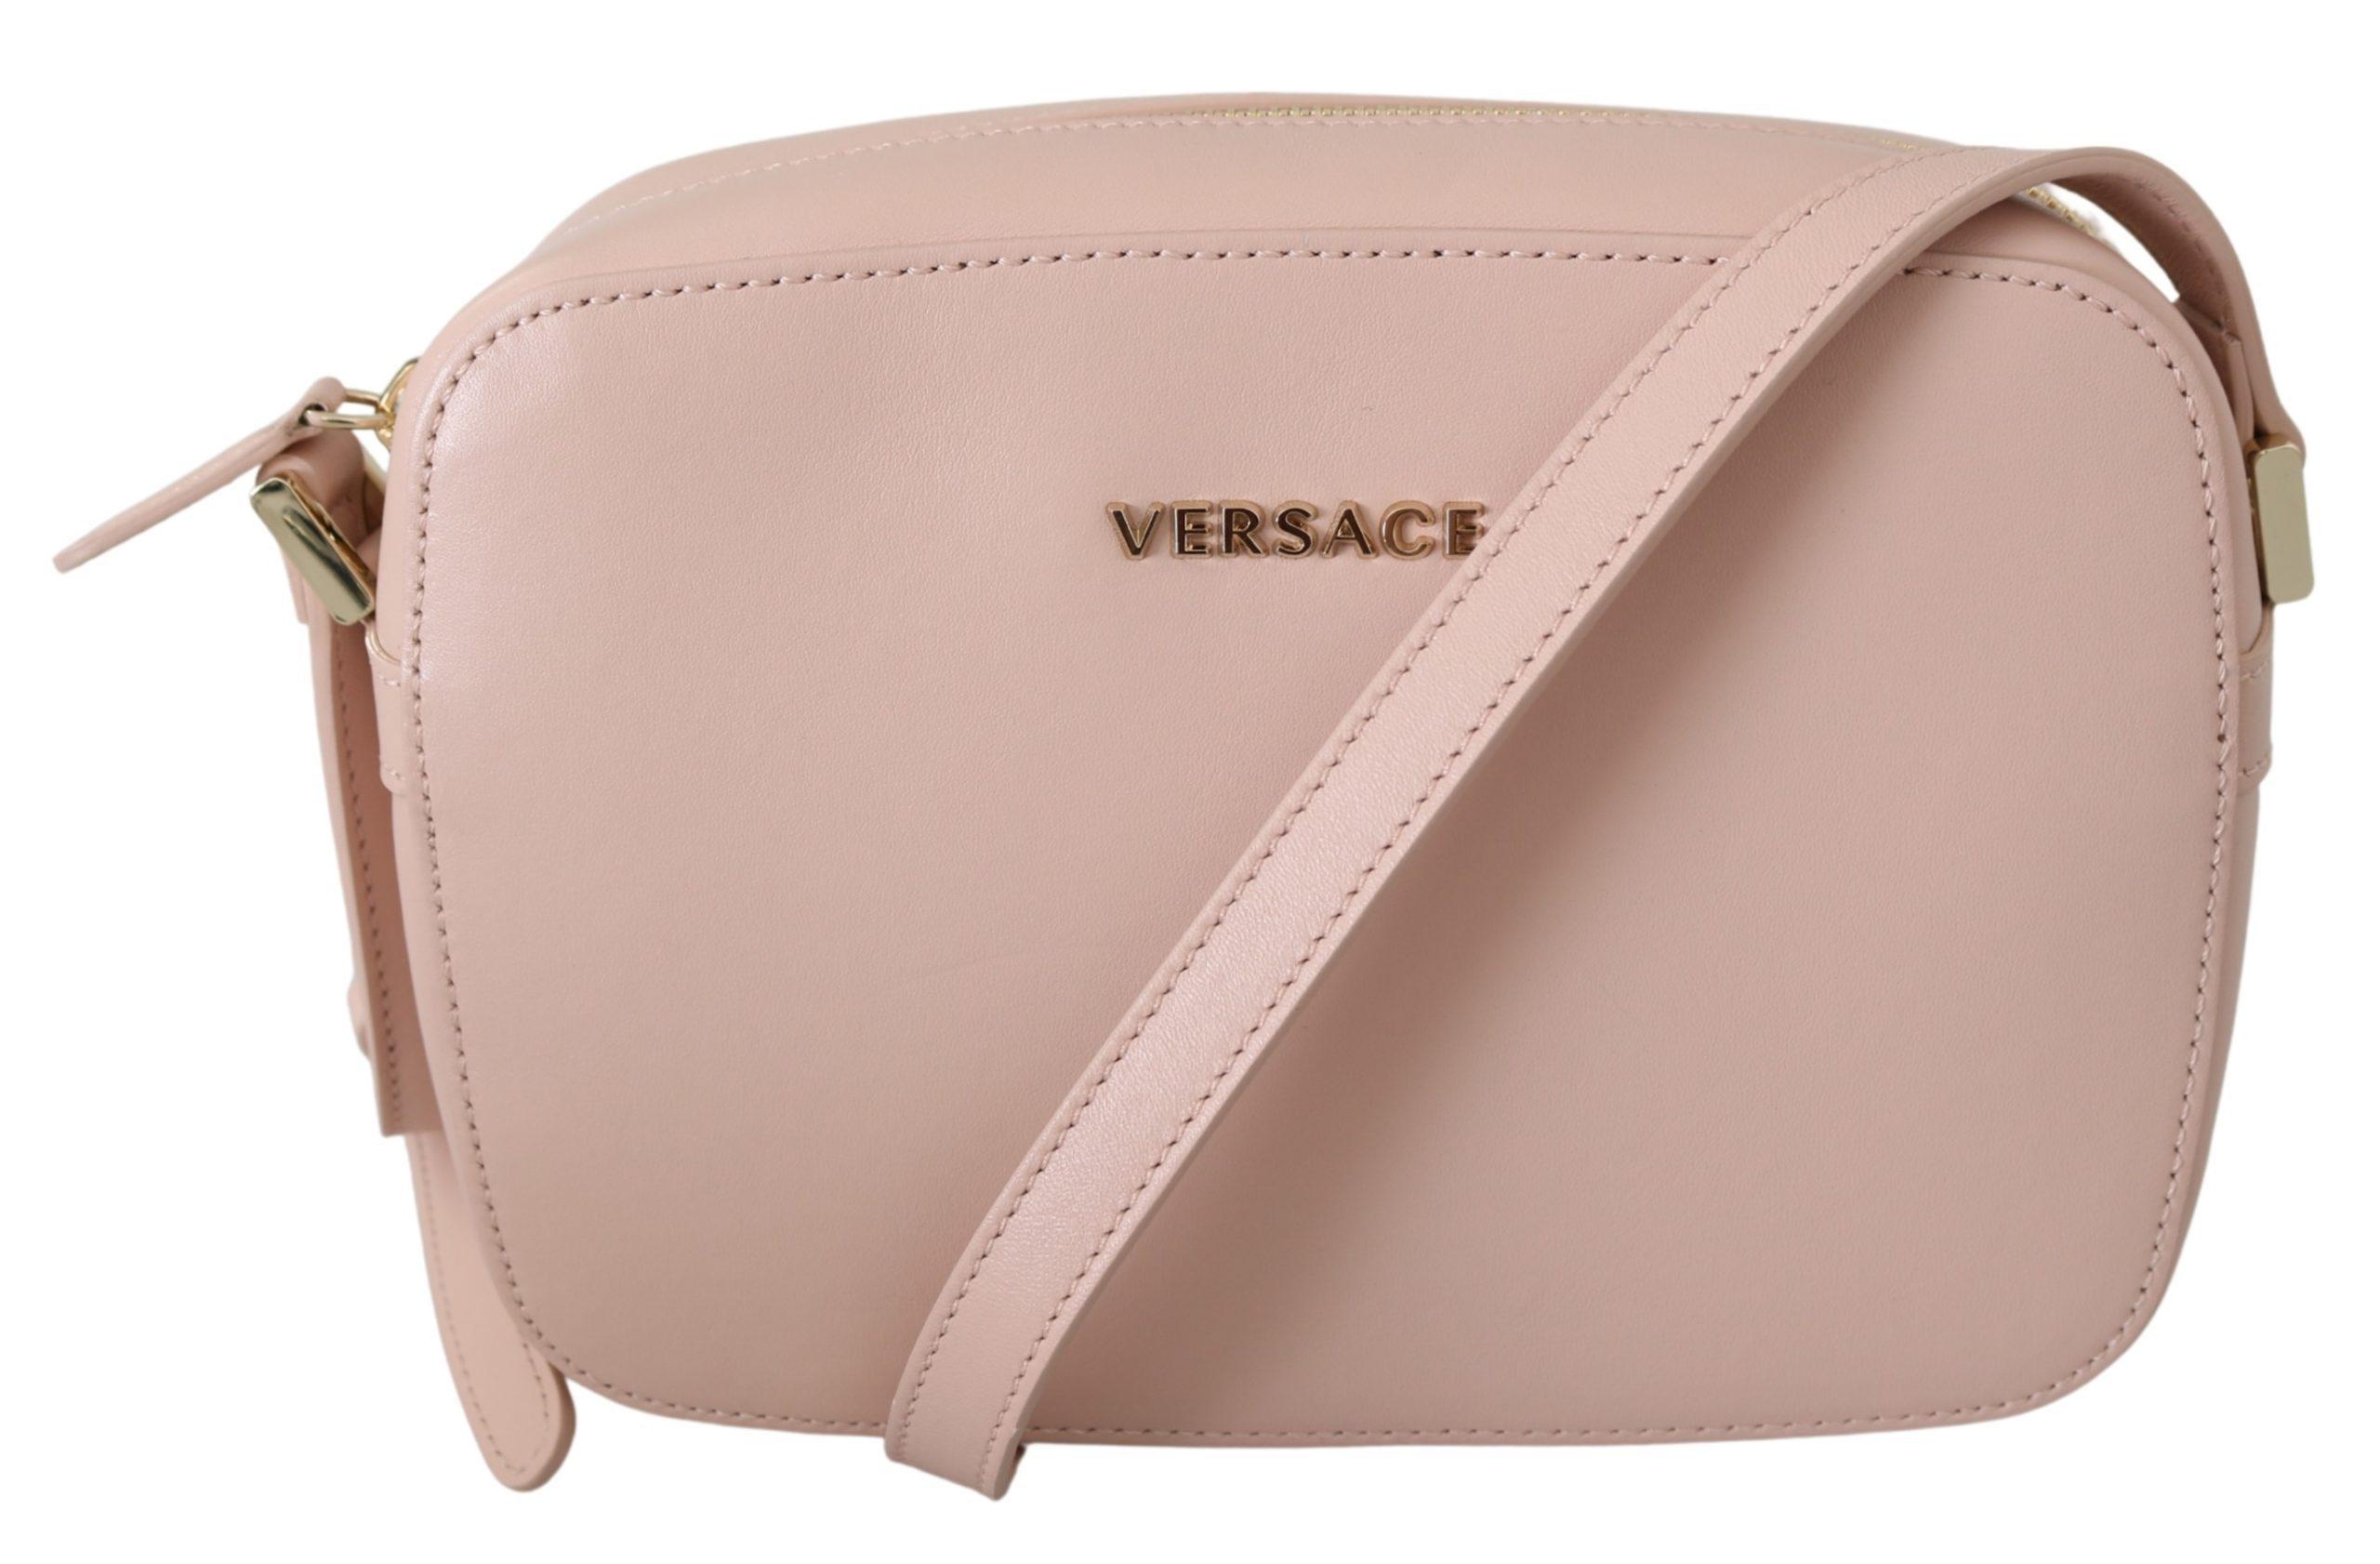 Versace Women's Leather Crossbody Bag Pink 8053850421633